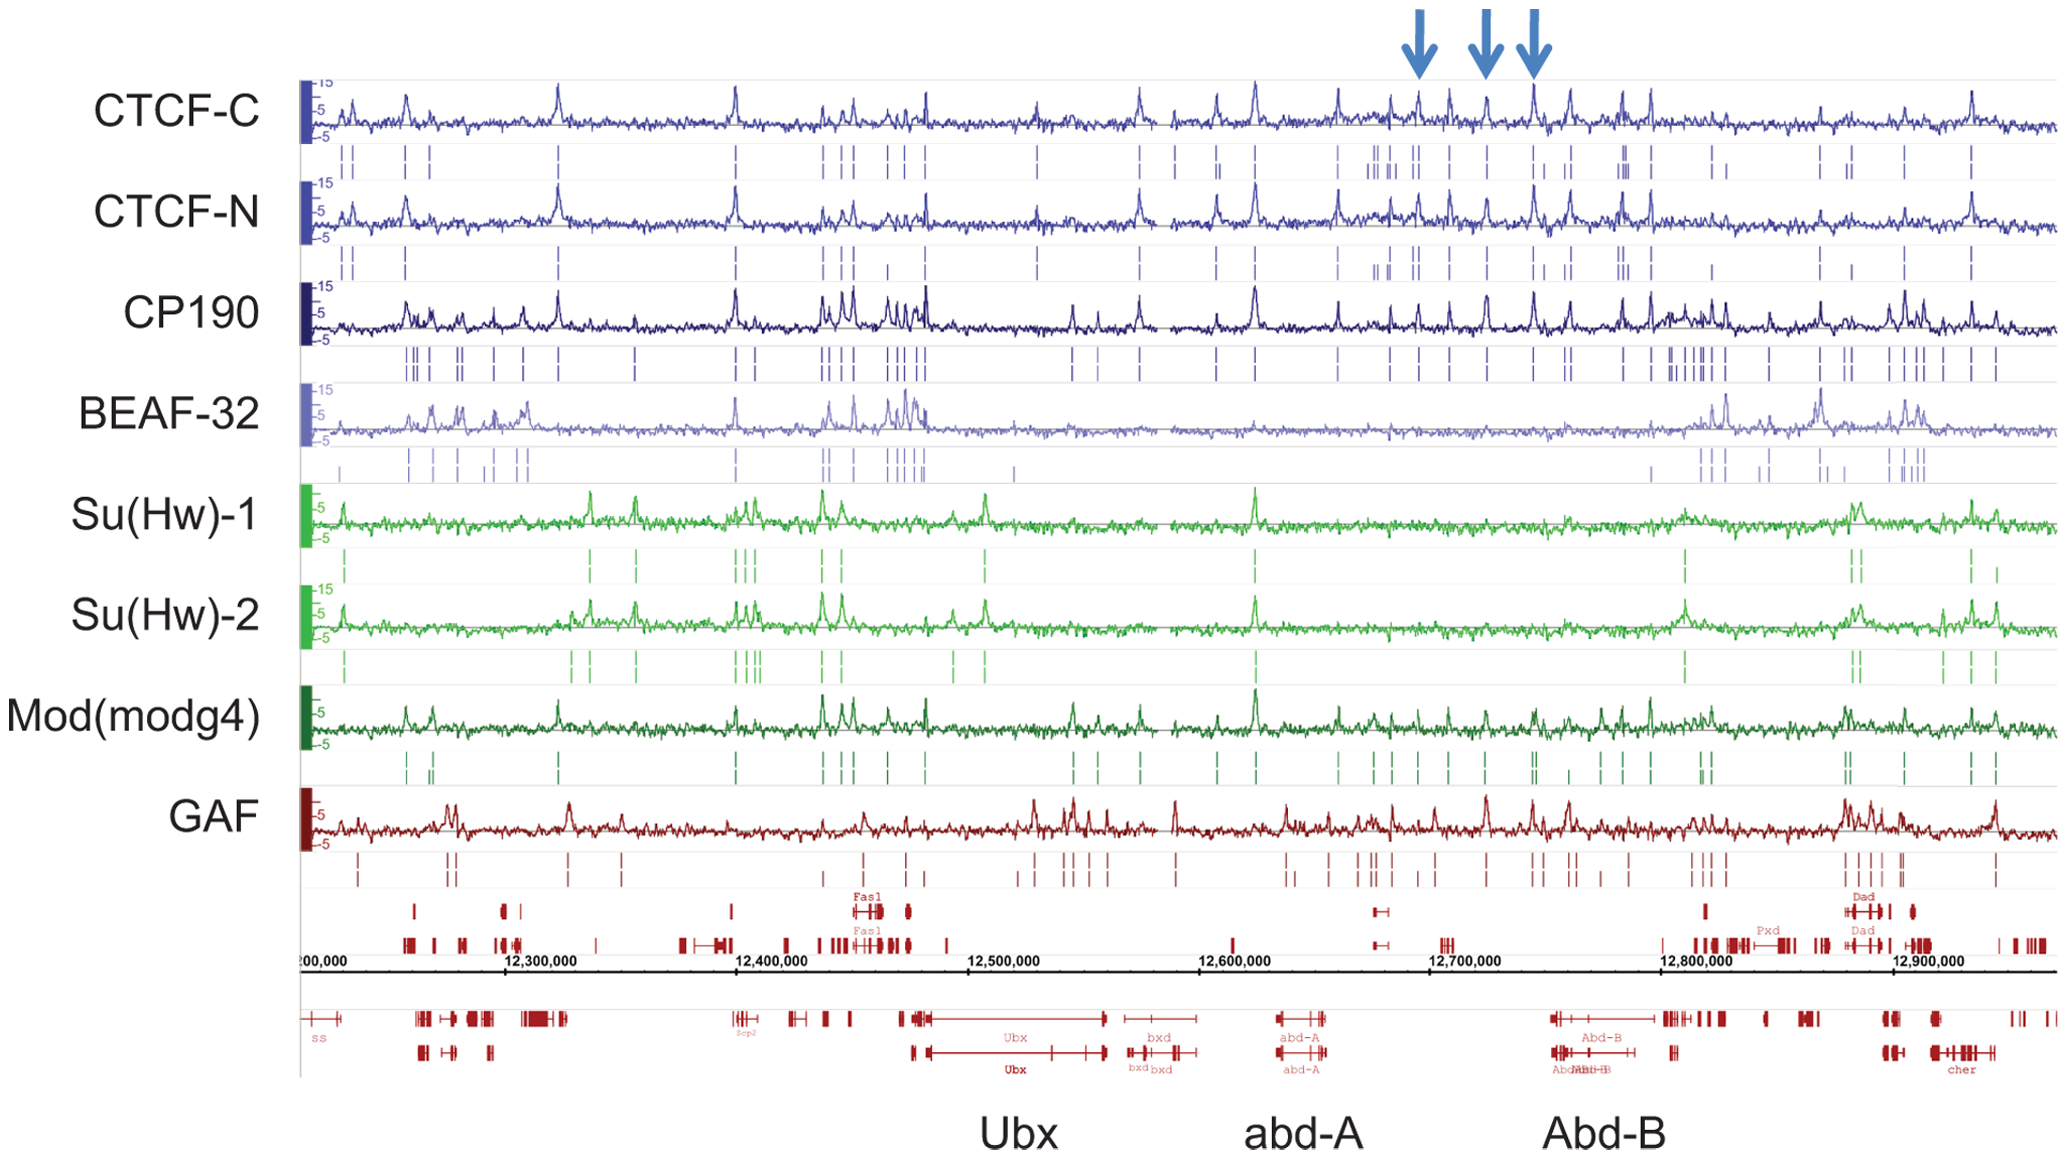 Binding profile of insulator-associated proteins in <i>Drosophila</i>.